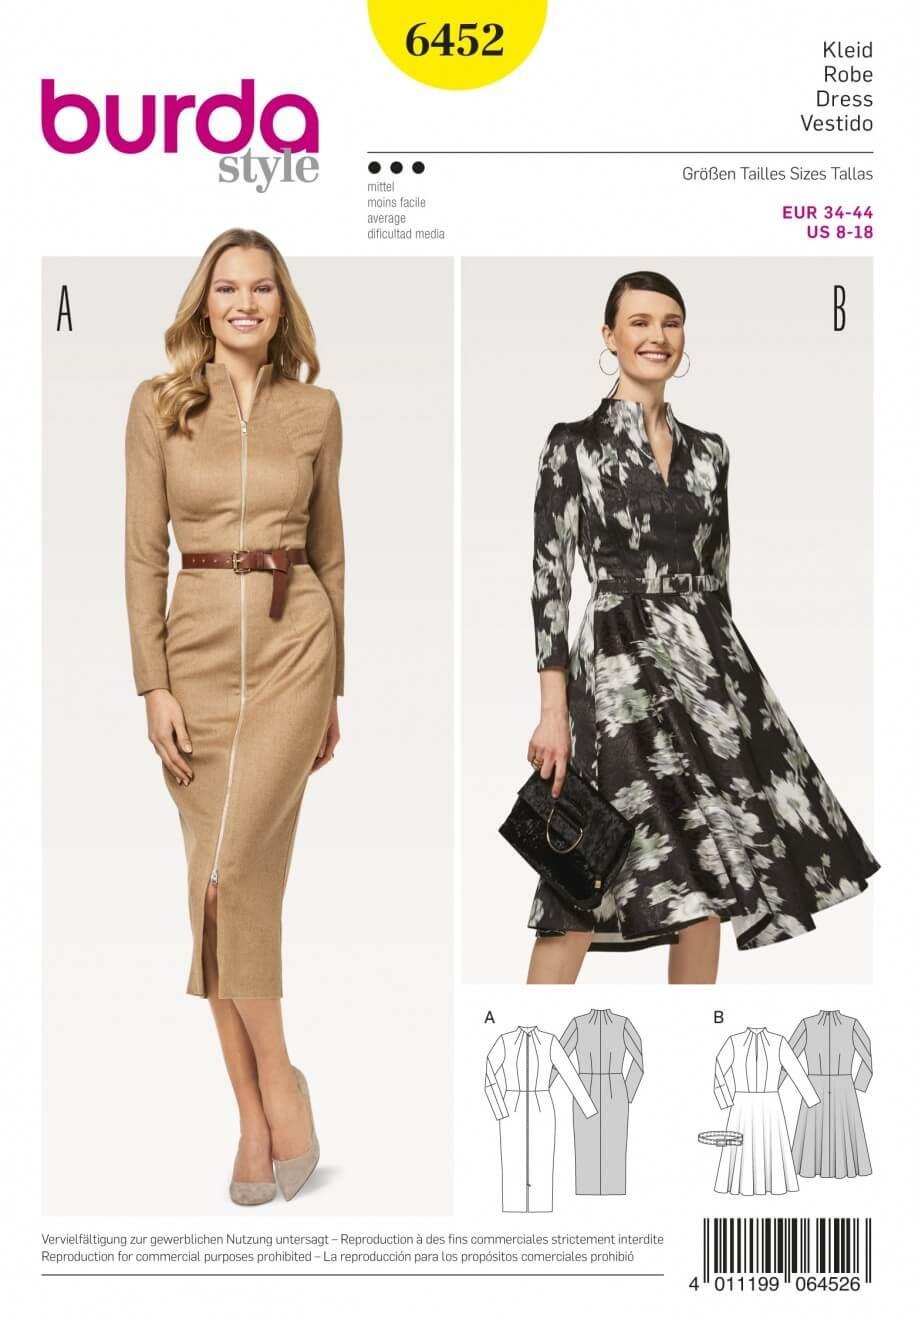 Burda Women's High Collar Pencil or Flare Dresses Sewing Pattern 6452